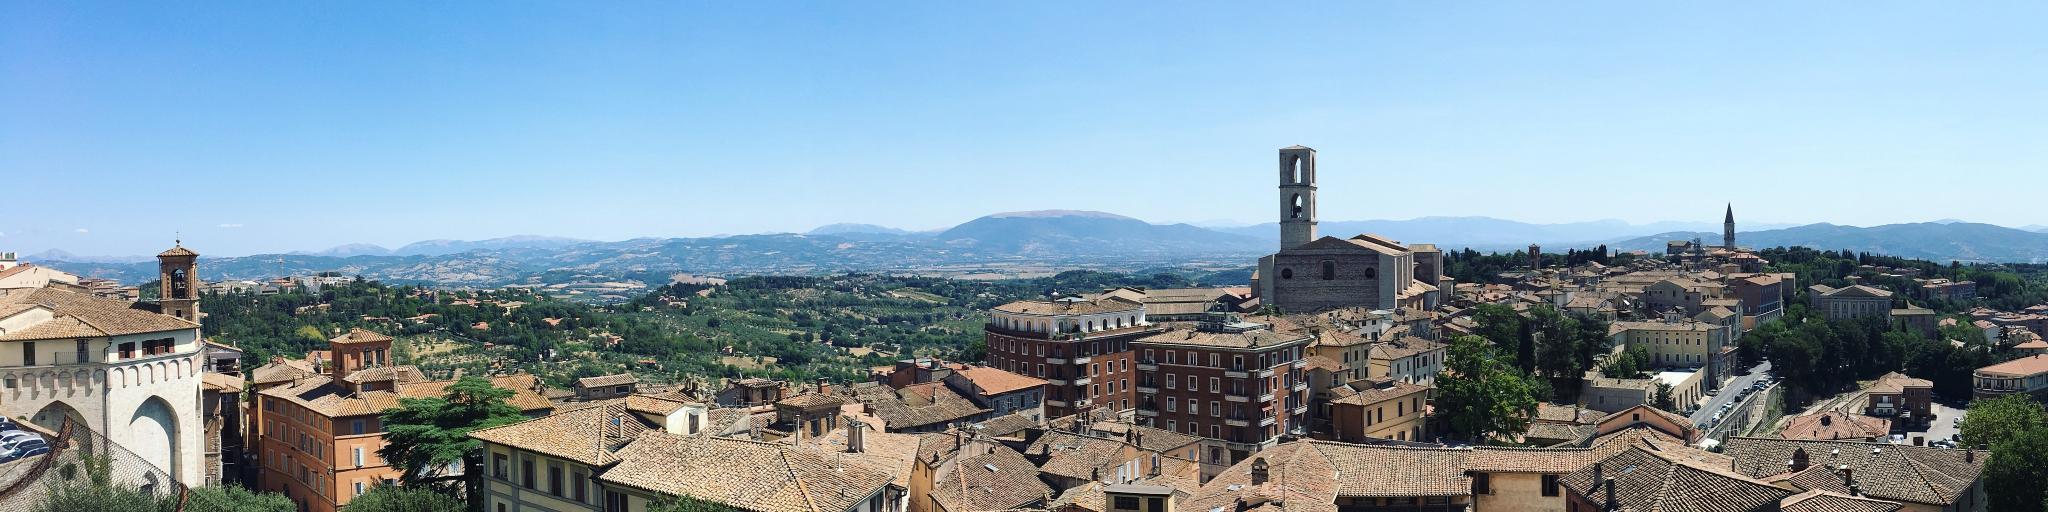 Hilltops in Perugia, Italy